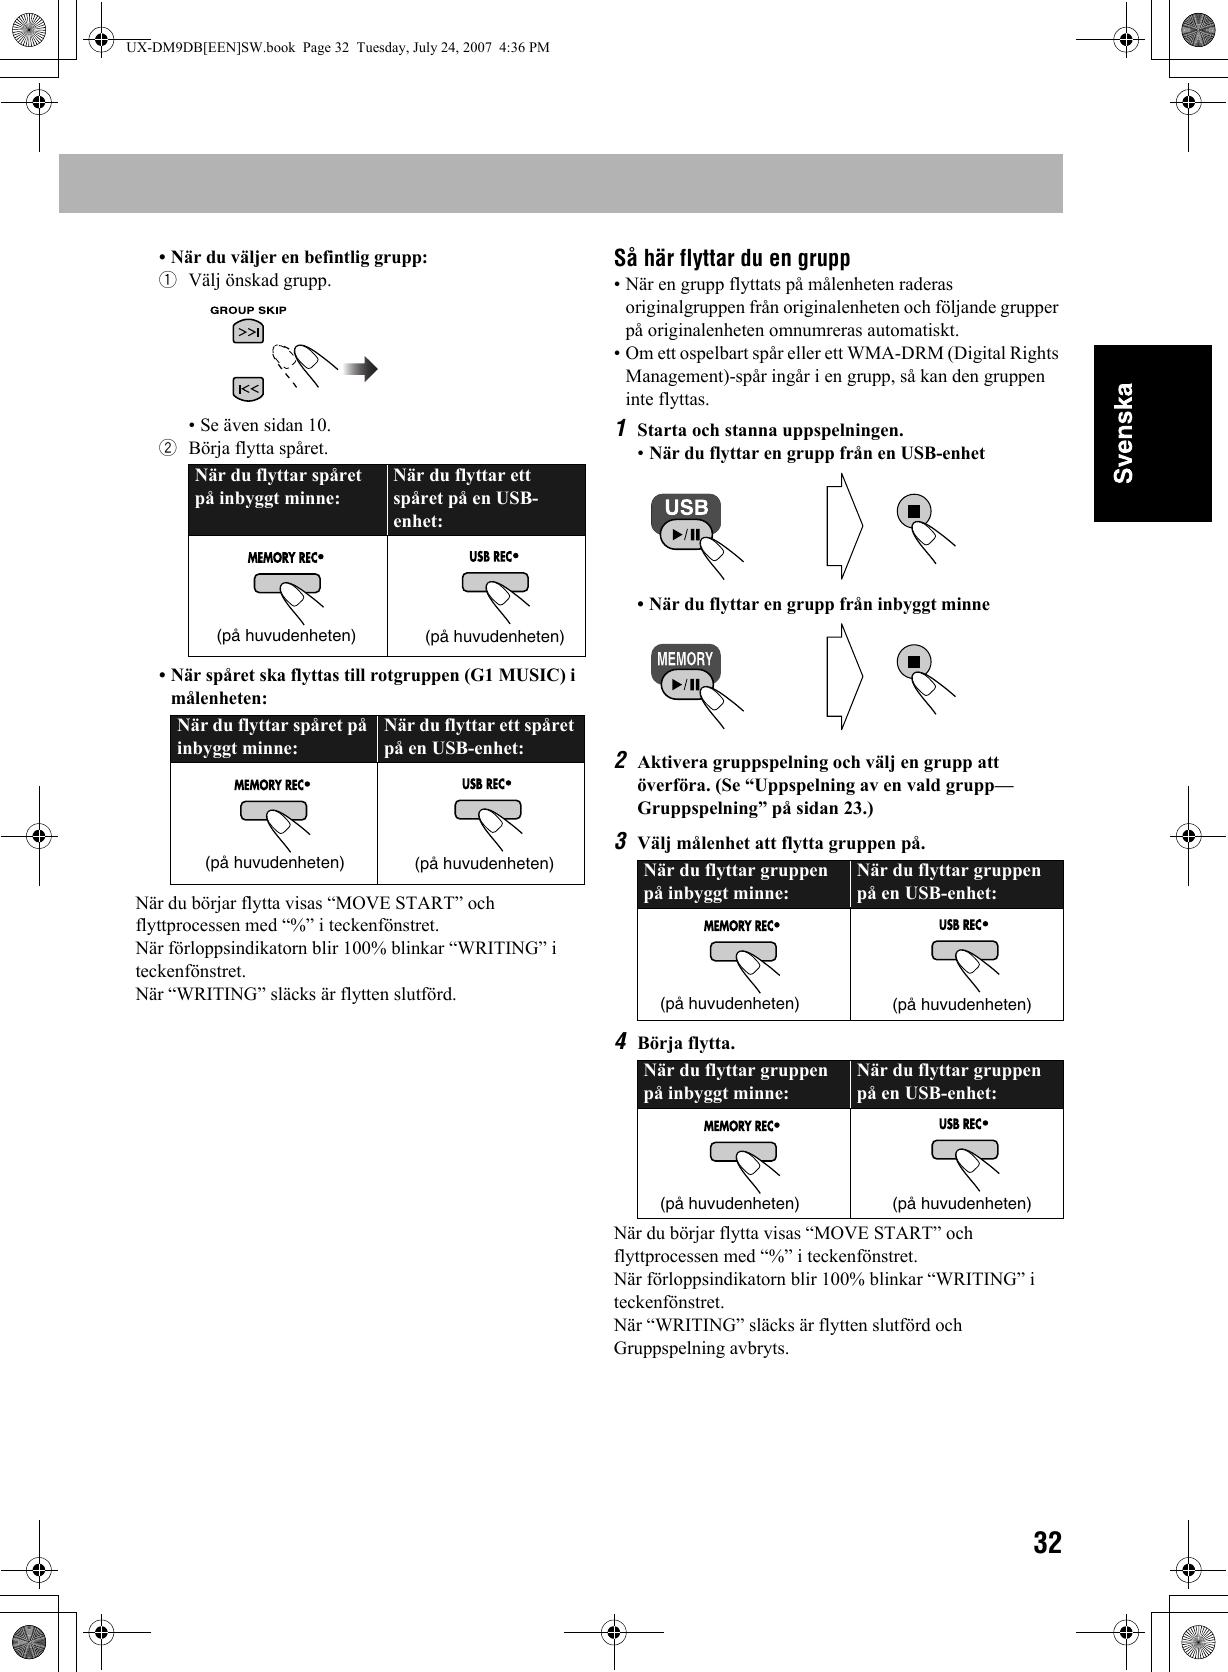 Großzügig Autozugangssystem Ideen - Schaltplan Serie Circuit ...